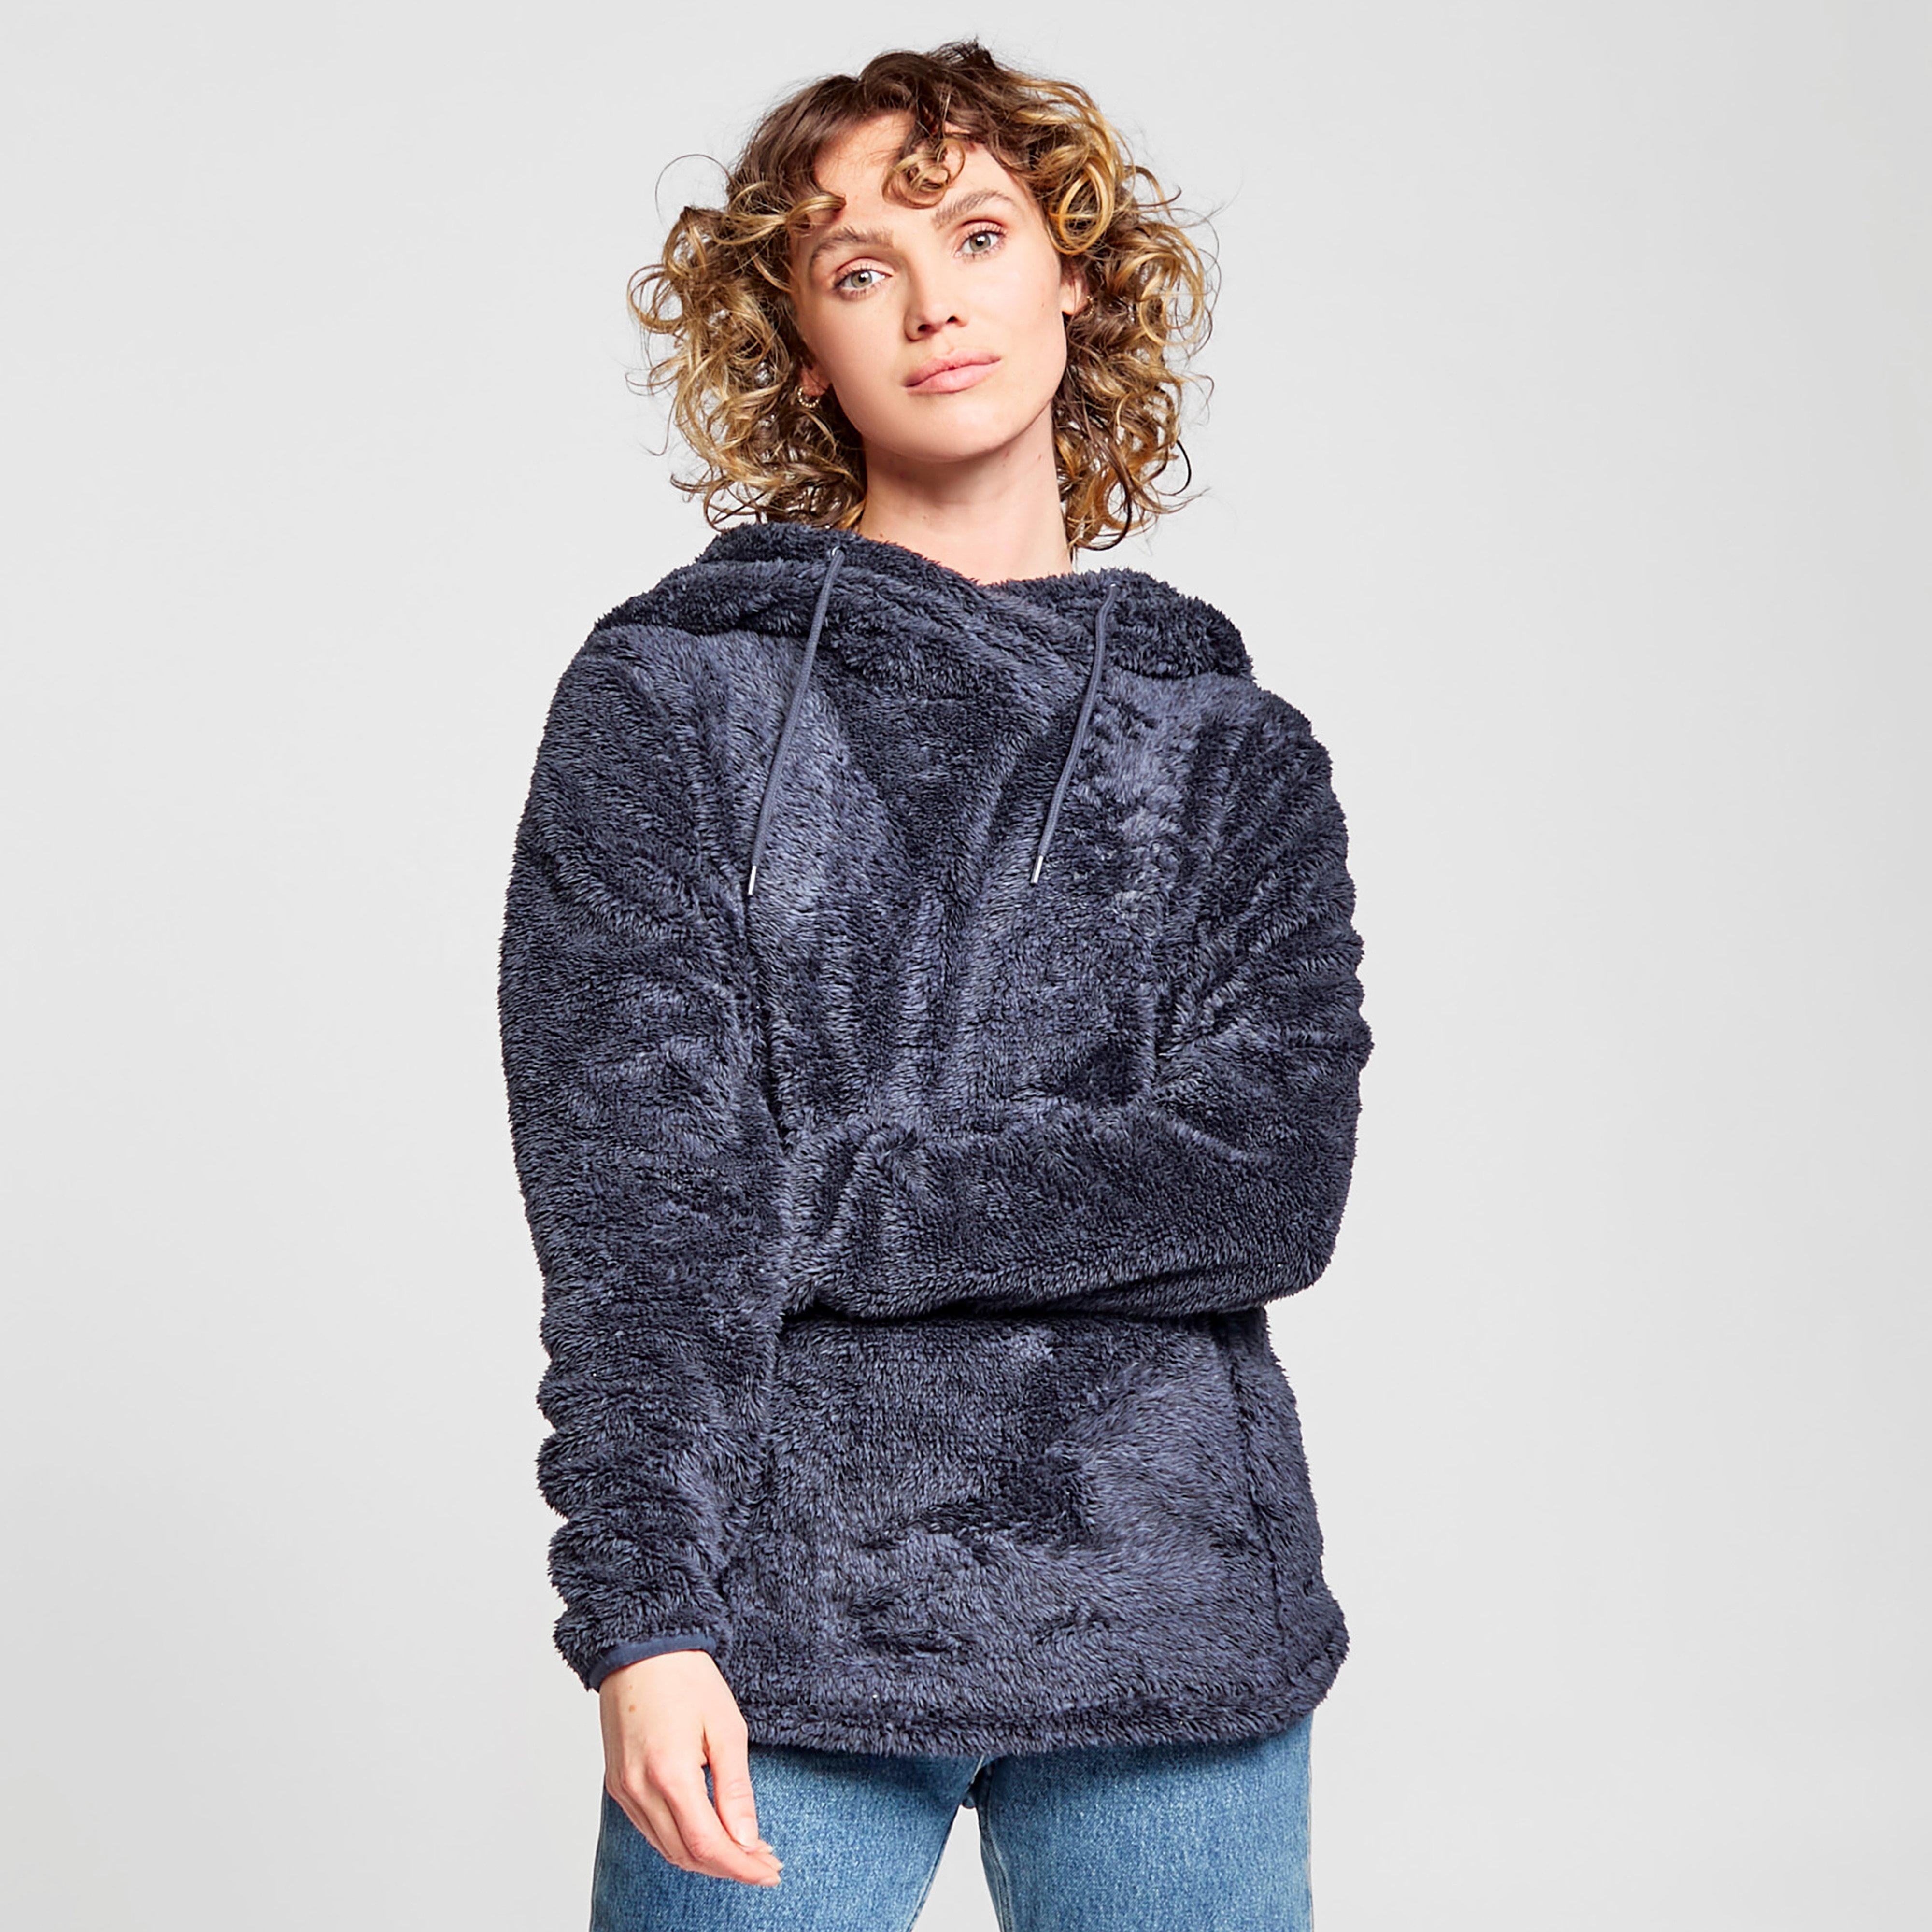 Peter Storm Women's Yogi Fleece - Nvy/Nvy, Navy